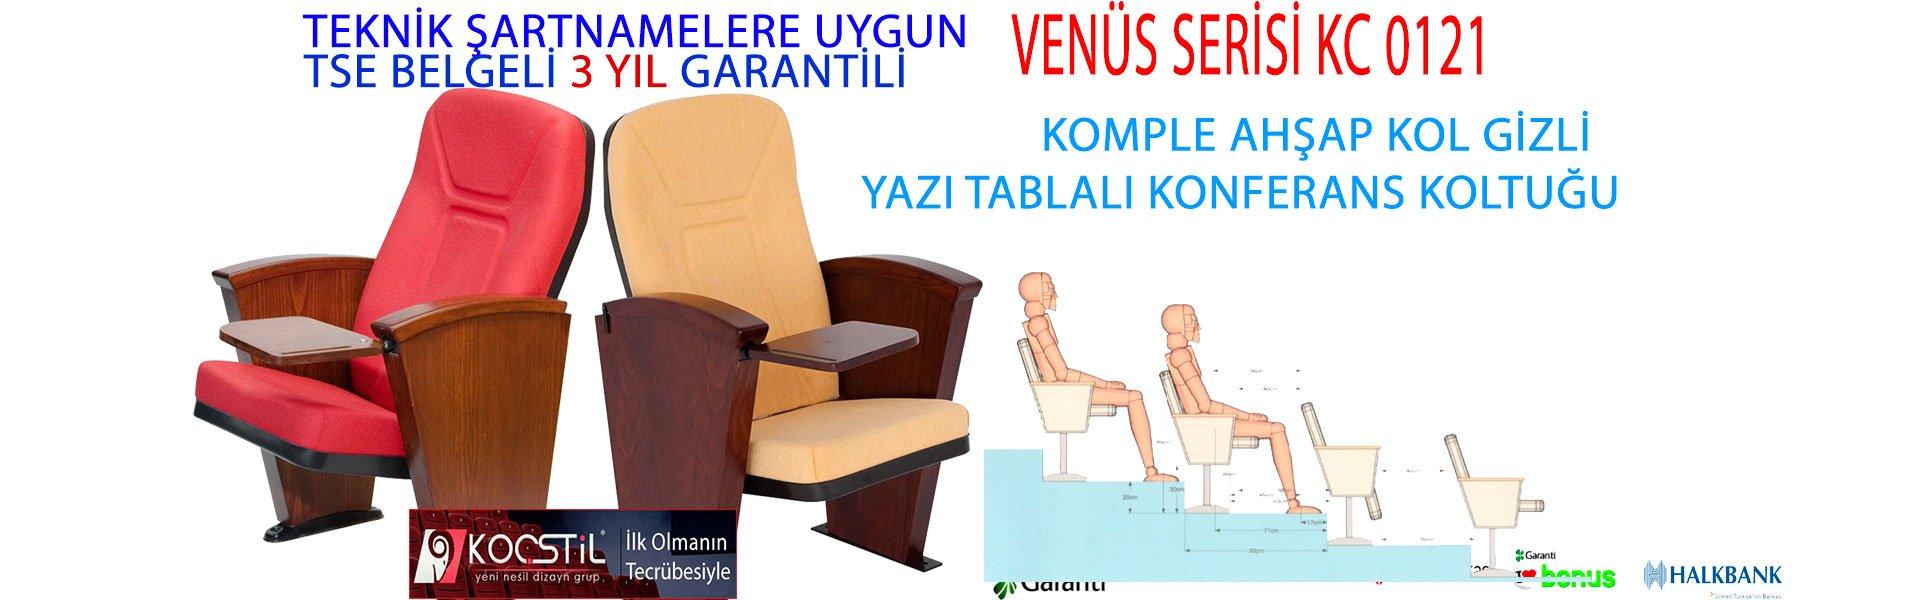 KOMPLE AHŞAP KOL GİZLİ YAZI TABLALI KONFERANS KOLTUĞU